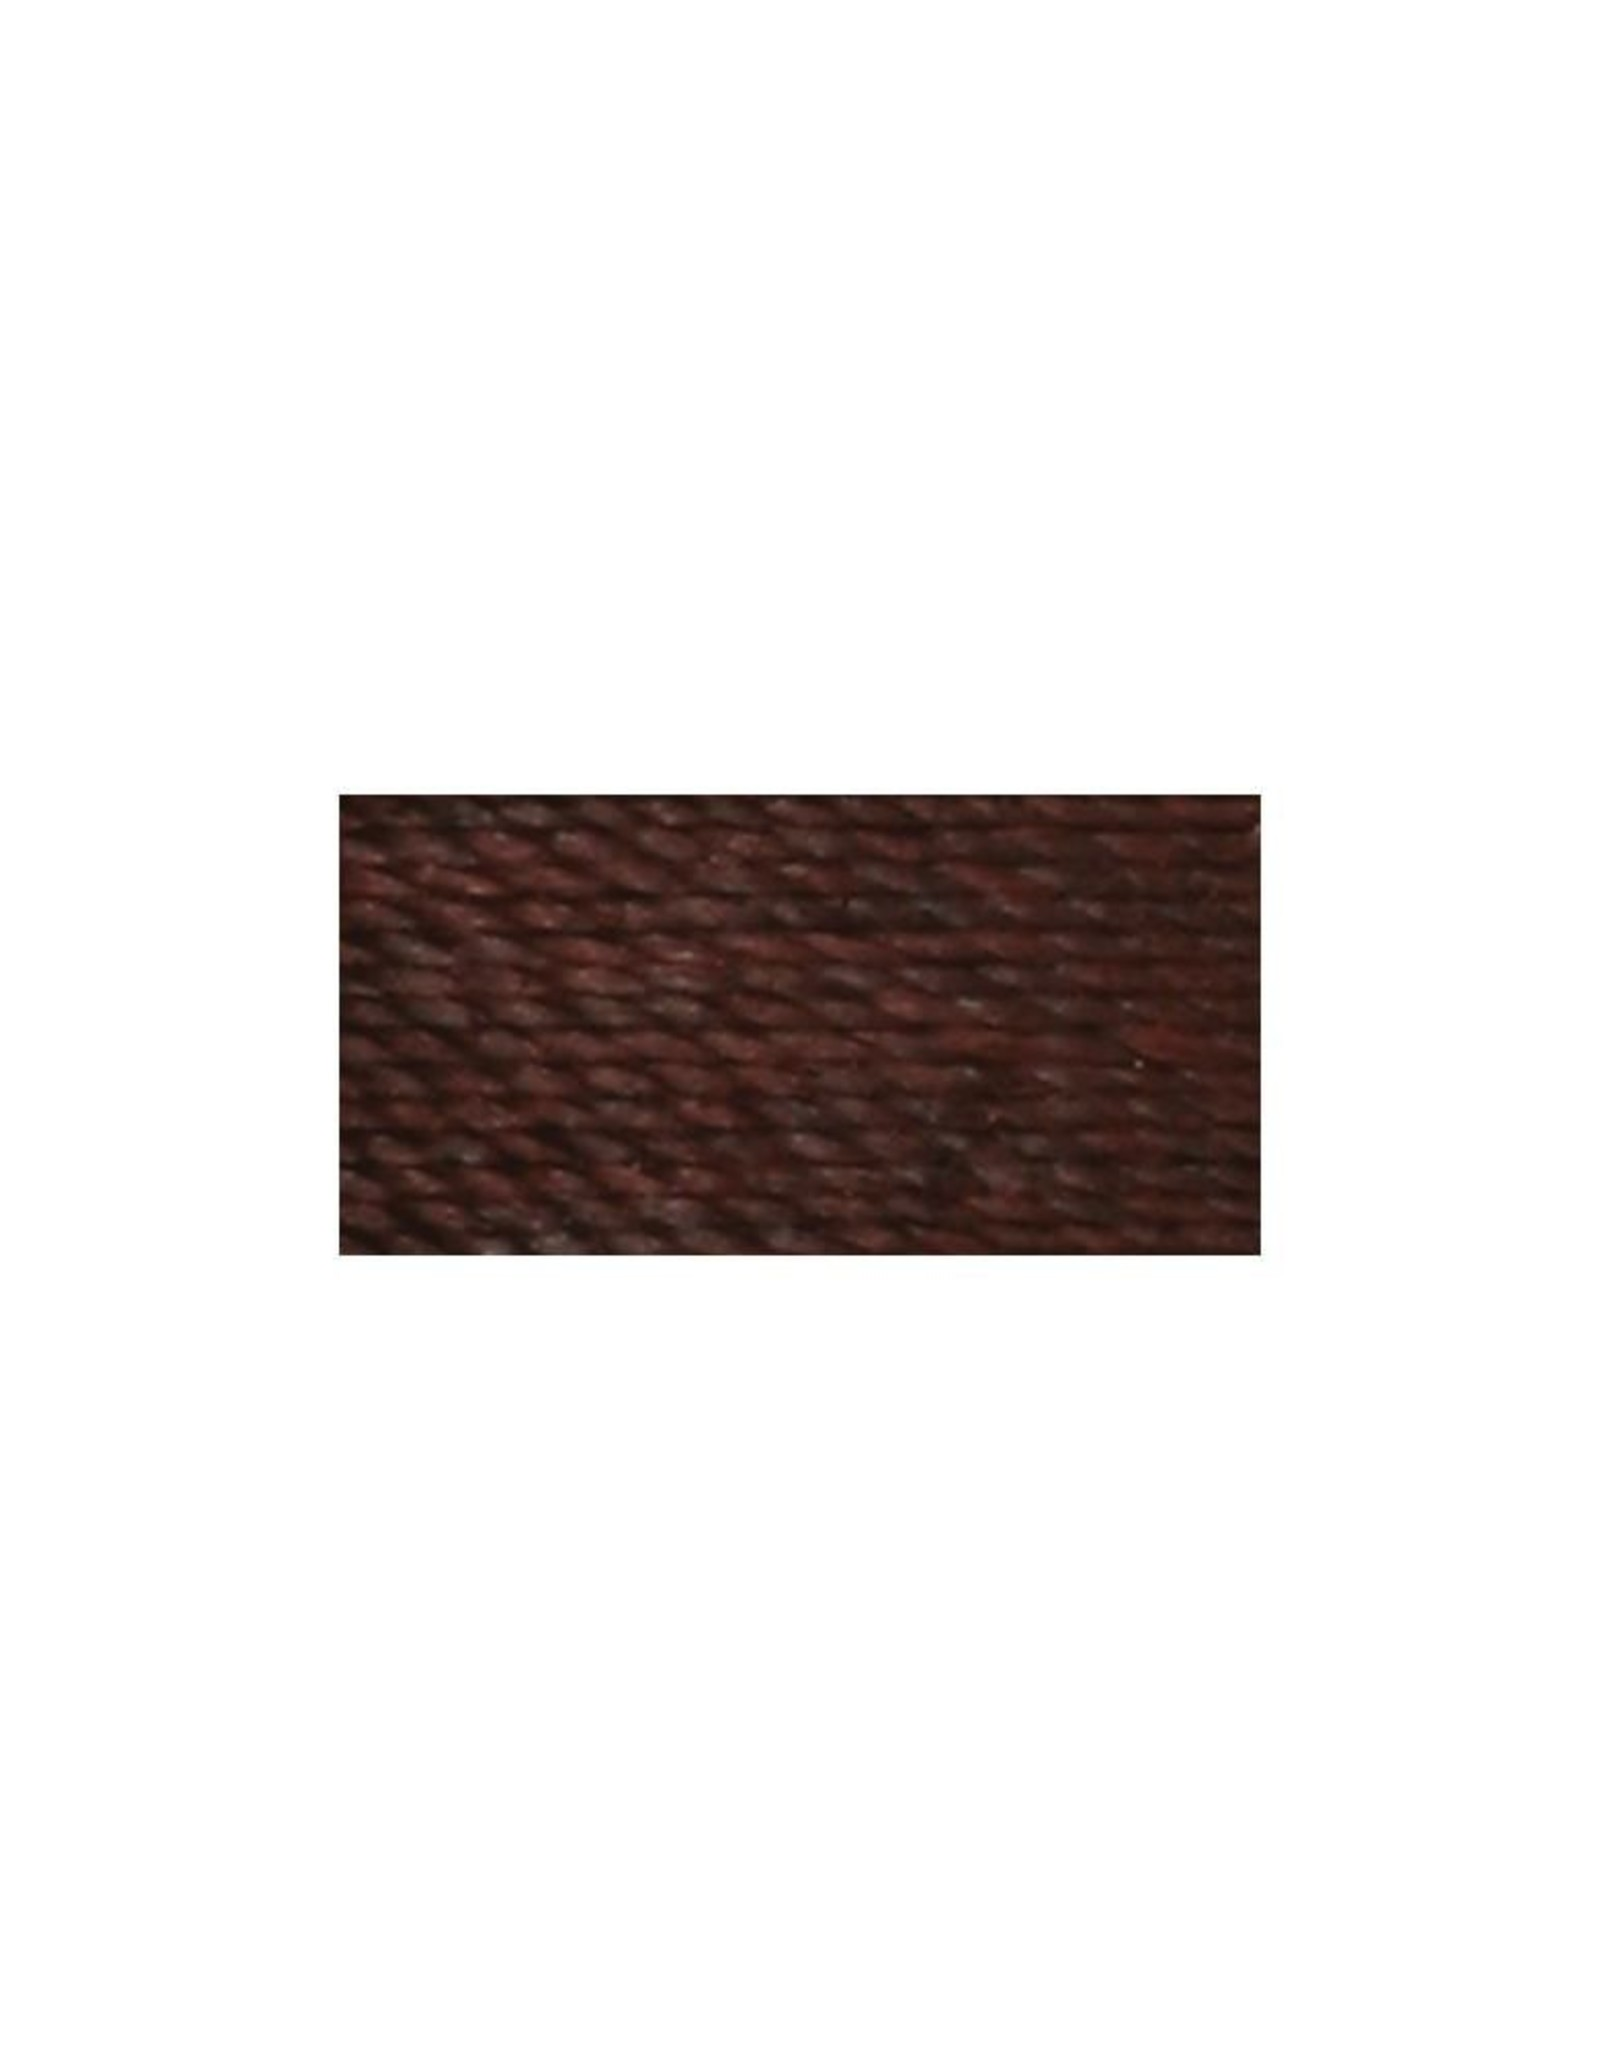 Dual Duty XP General Purpose Thread 250yd, Brown